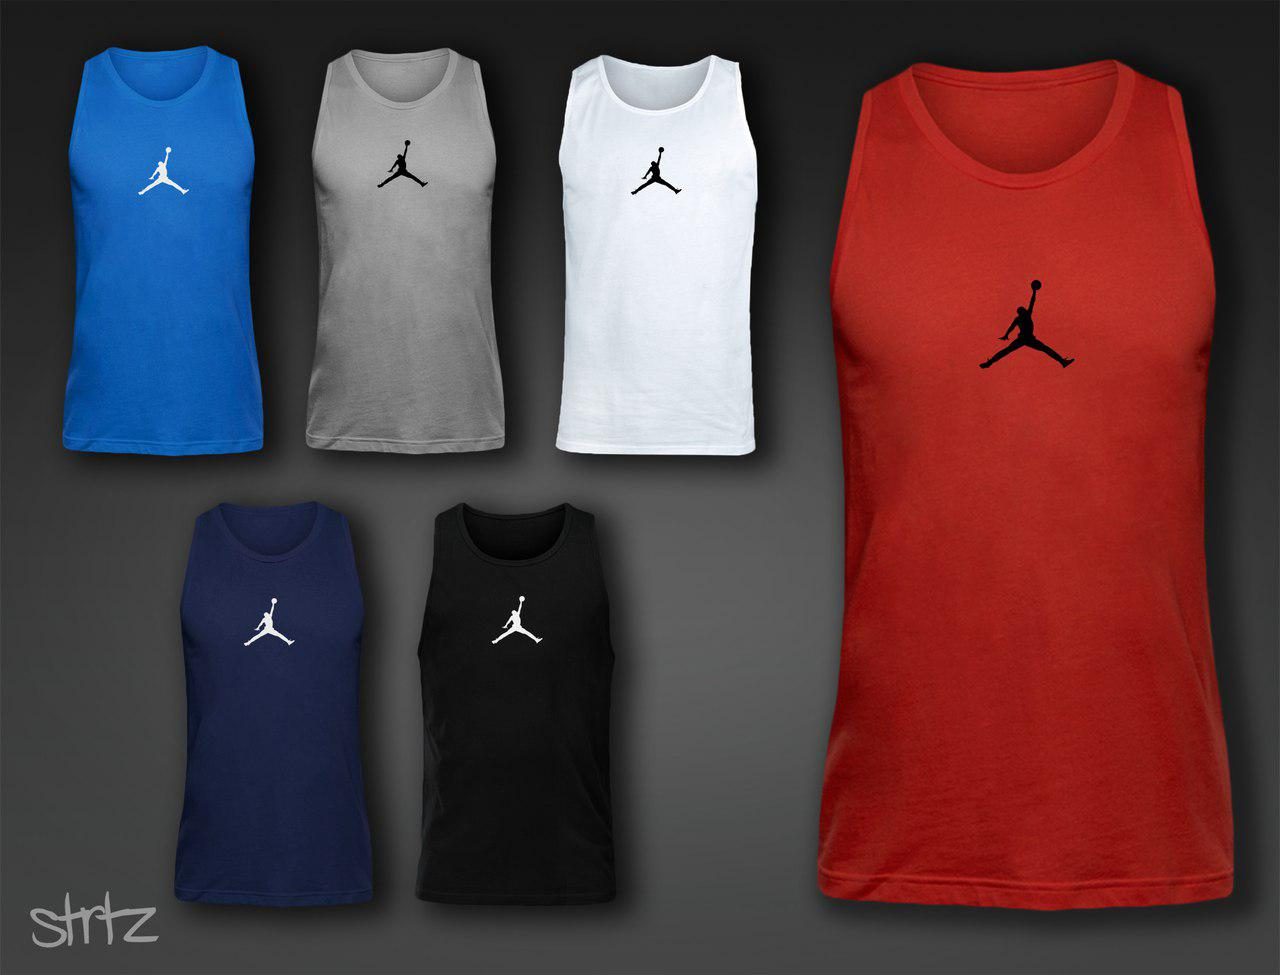 b7aa6c0d Летняя майка мужская модная баскетбольная майкл джордан Jordan: 245 ...